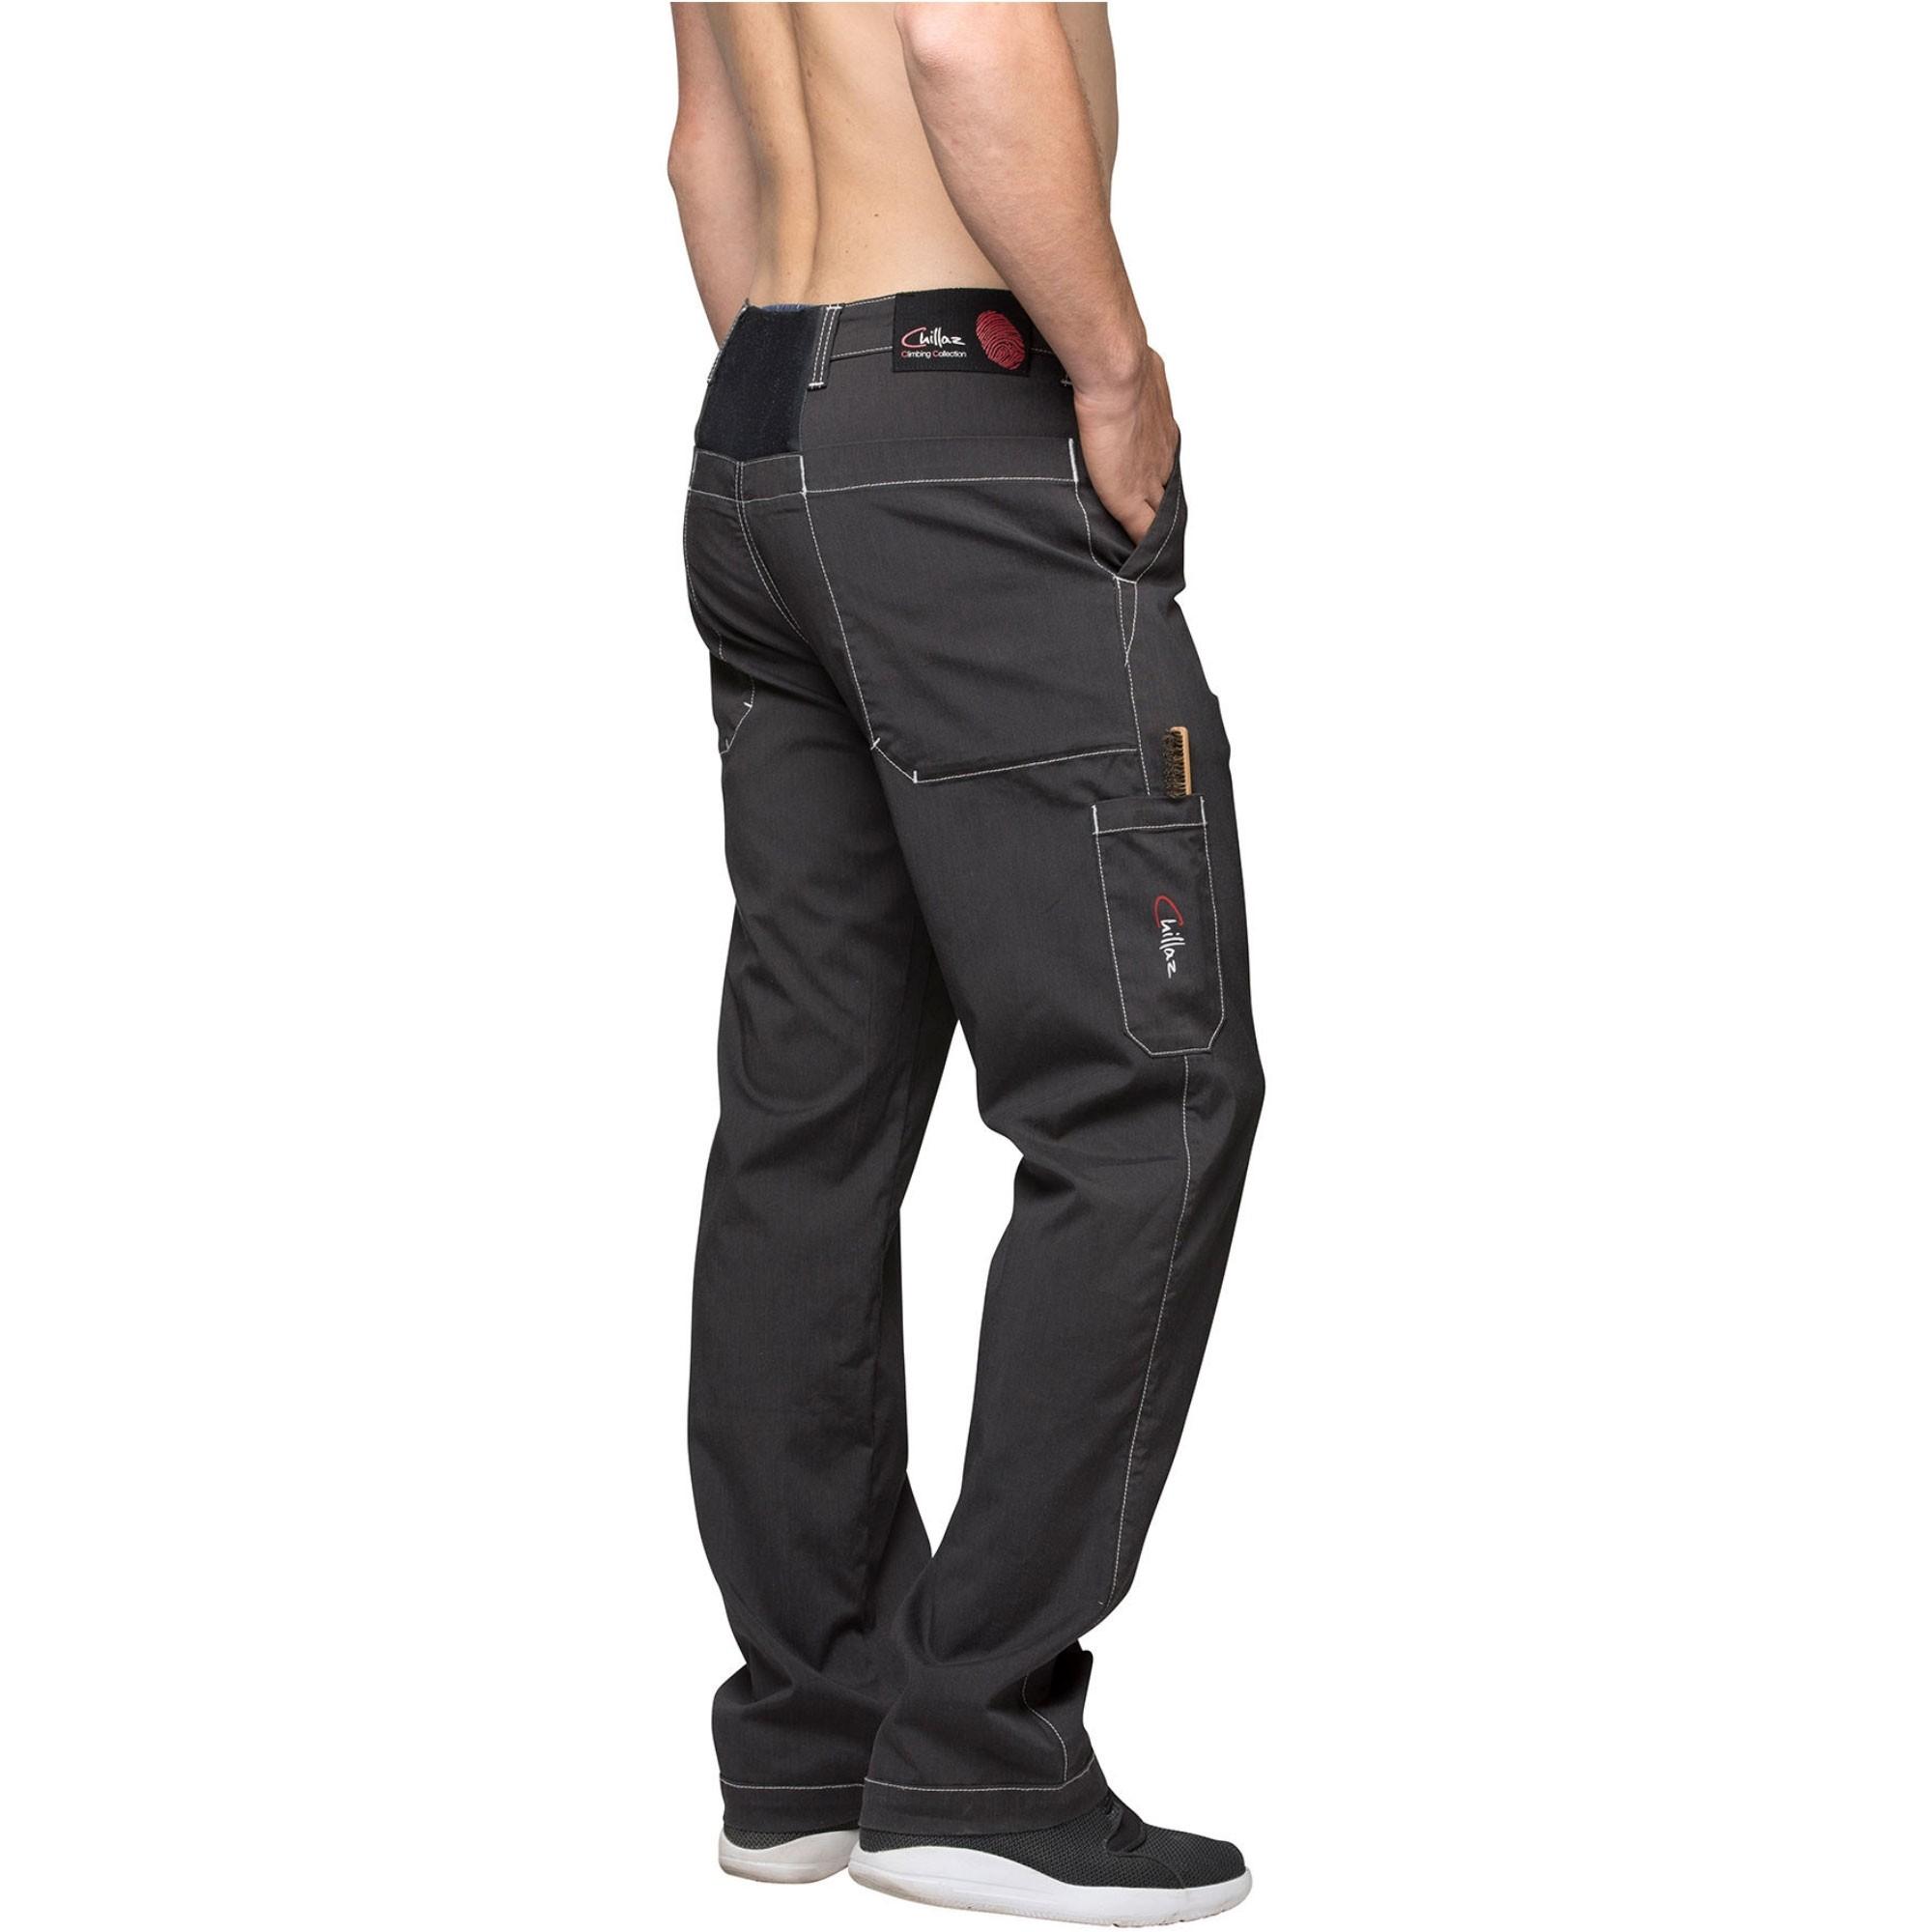 Chillaz Dani Climbing Pants - Titan - side